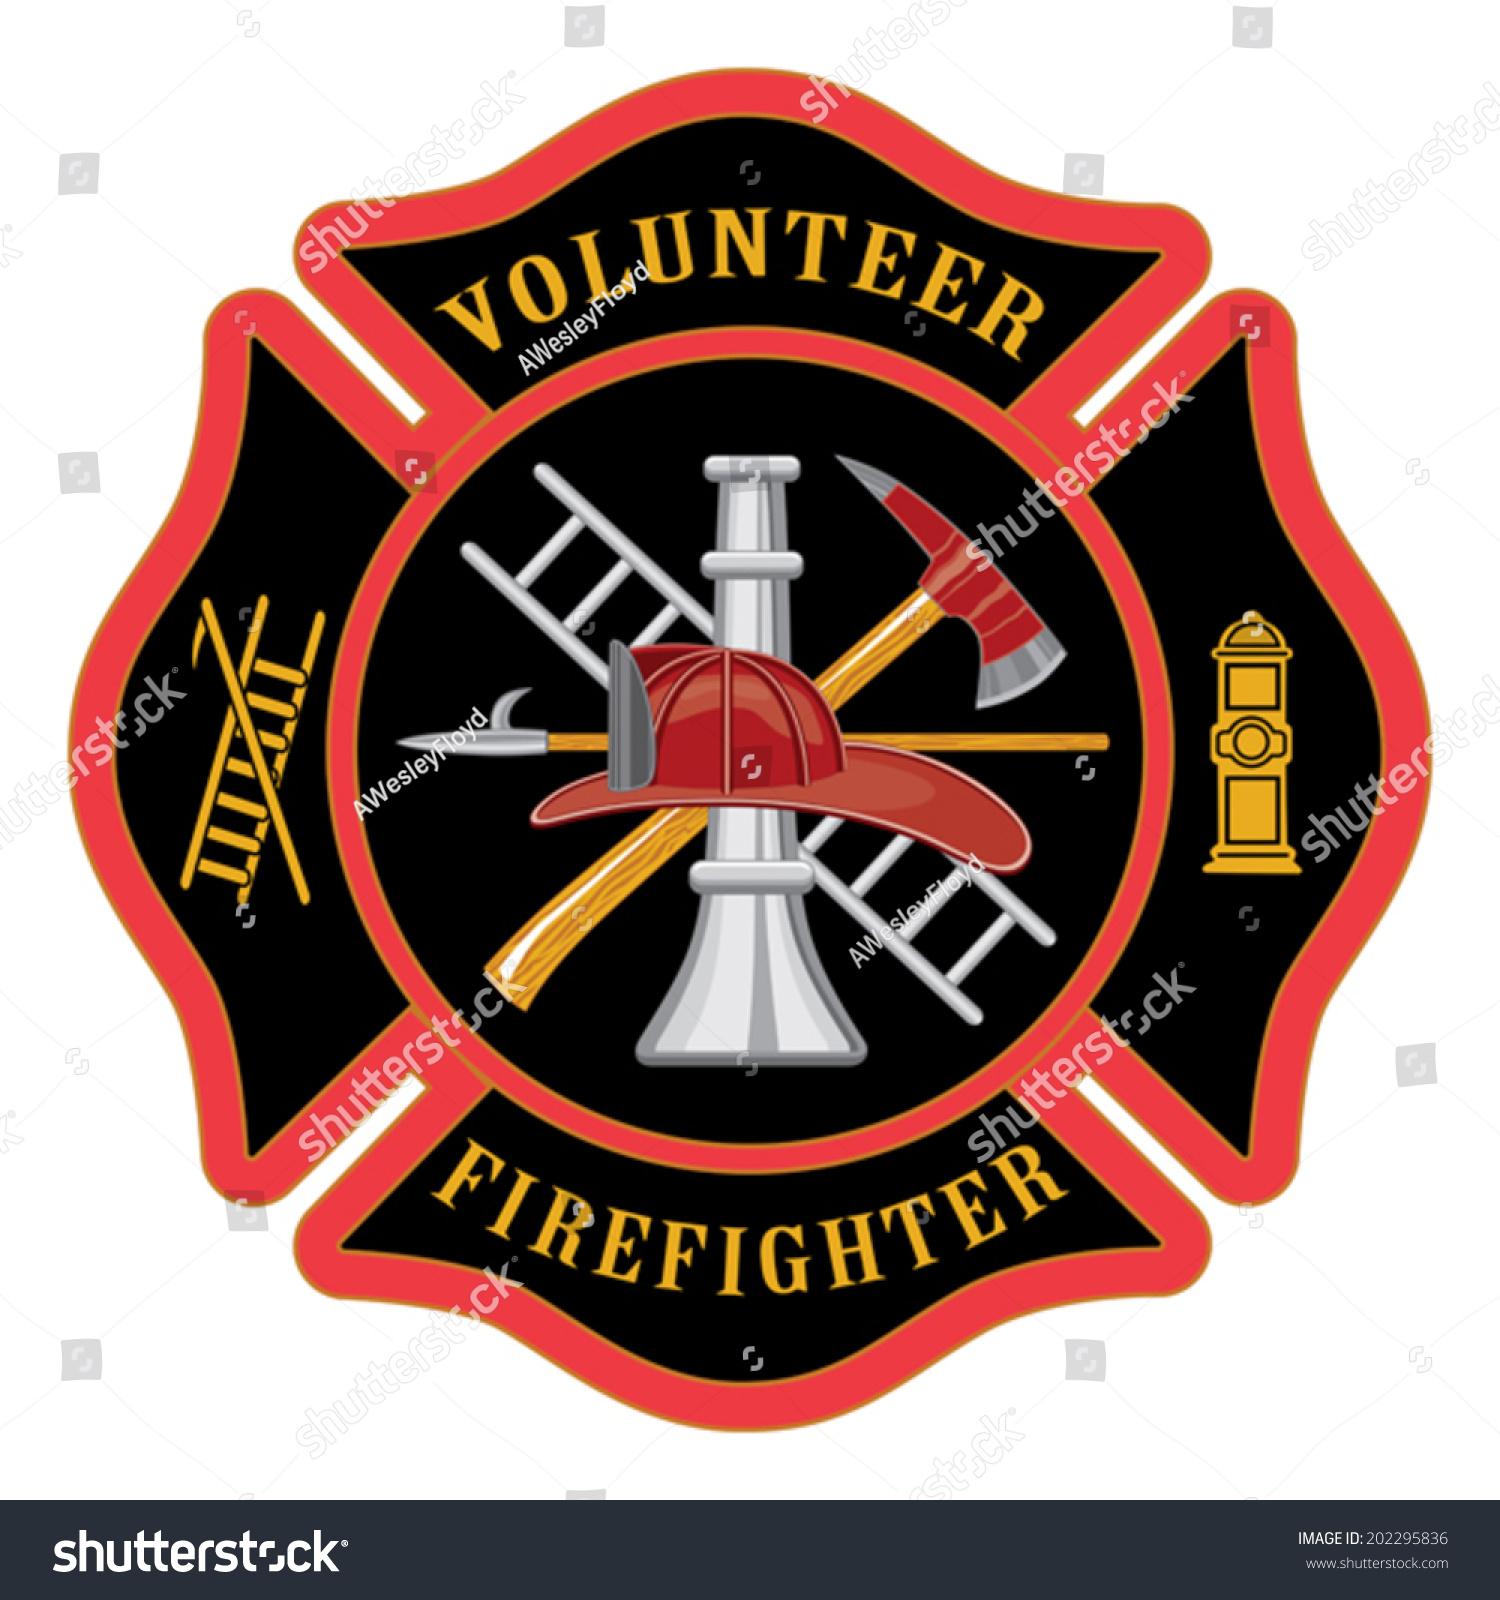 Volunteer firefighter maltese cross illustration firefighter stock volunteer firefighter maltese cross is an illustration of the firefighter or fire department maltese cross symbol biocorpaavc